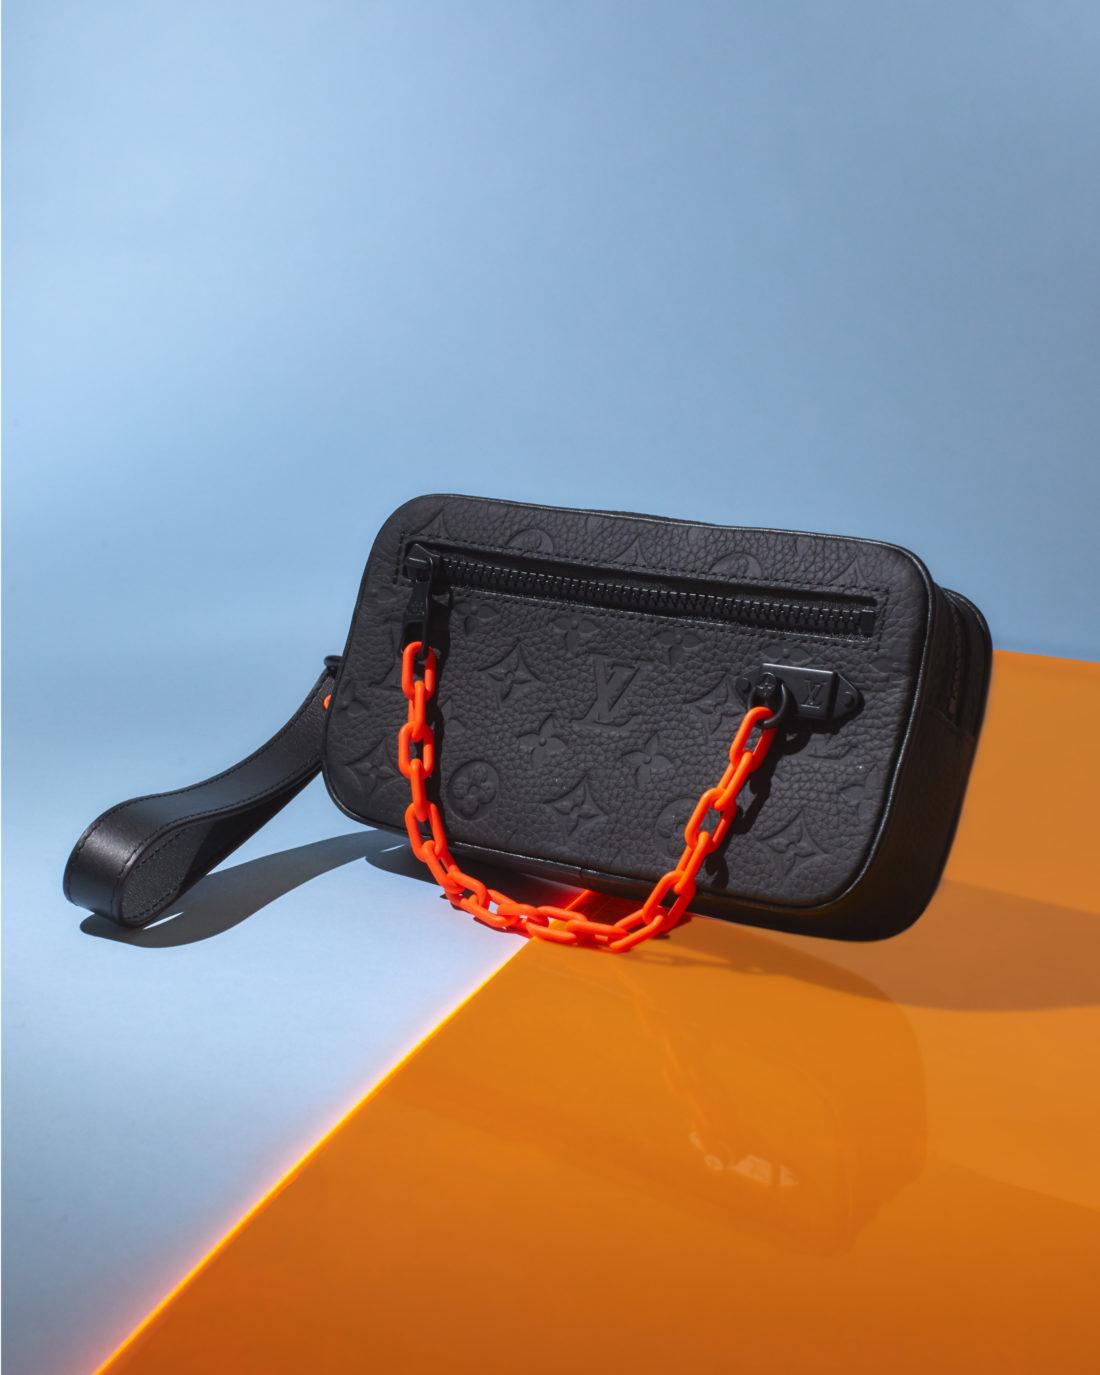 4eaf8b00c689 StockX Bags  Win The Louis Vuitton Pochette Designed By Virgil Abloh ...